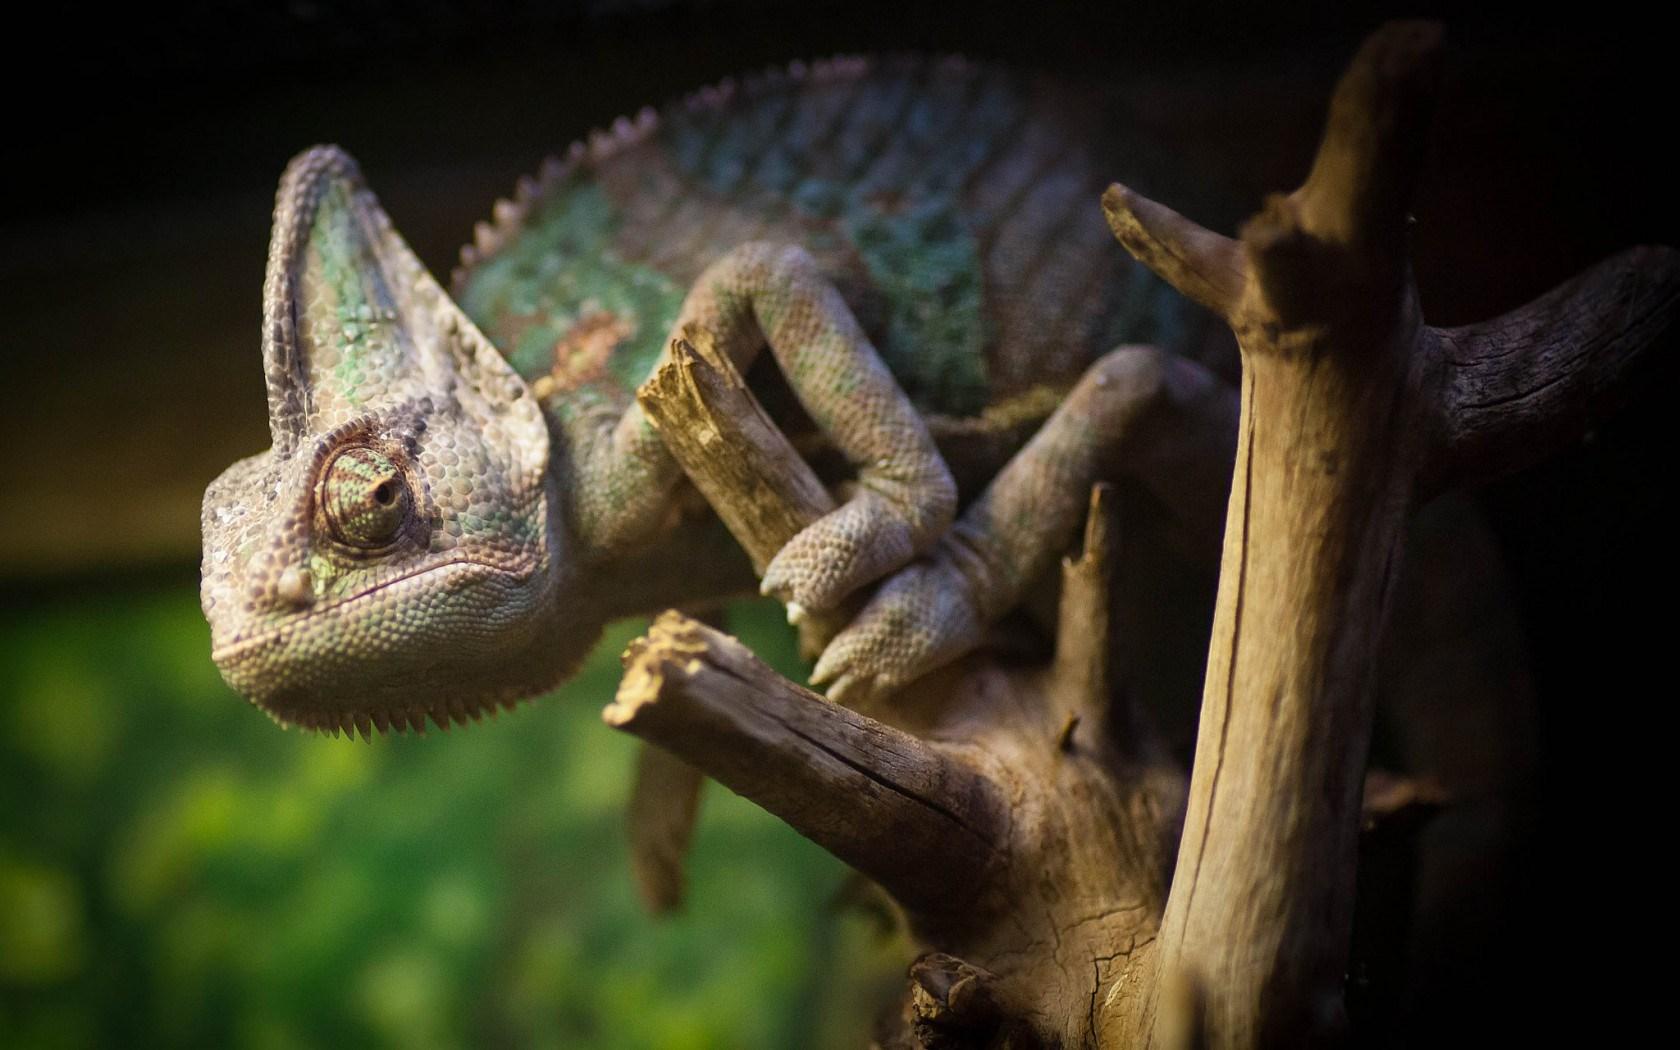 chameleon reptile computer wallpaper 49119